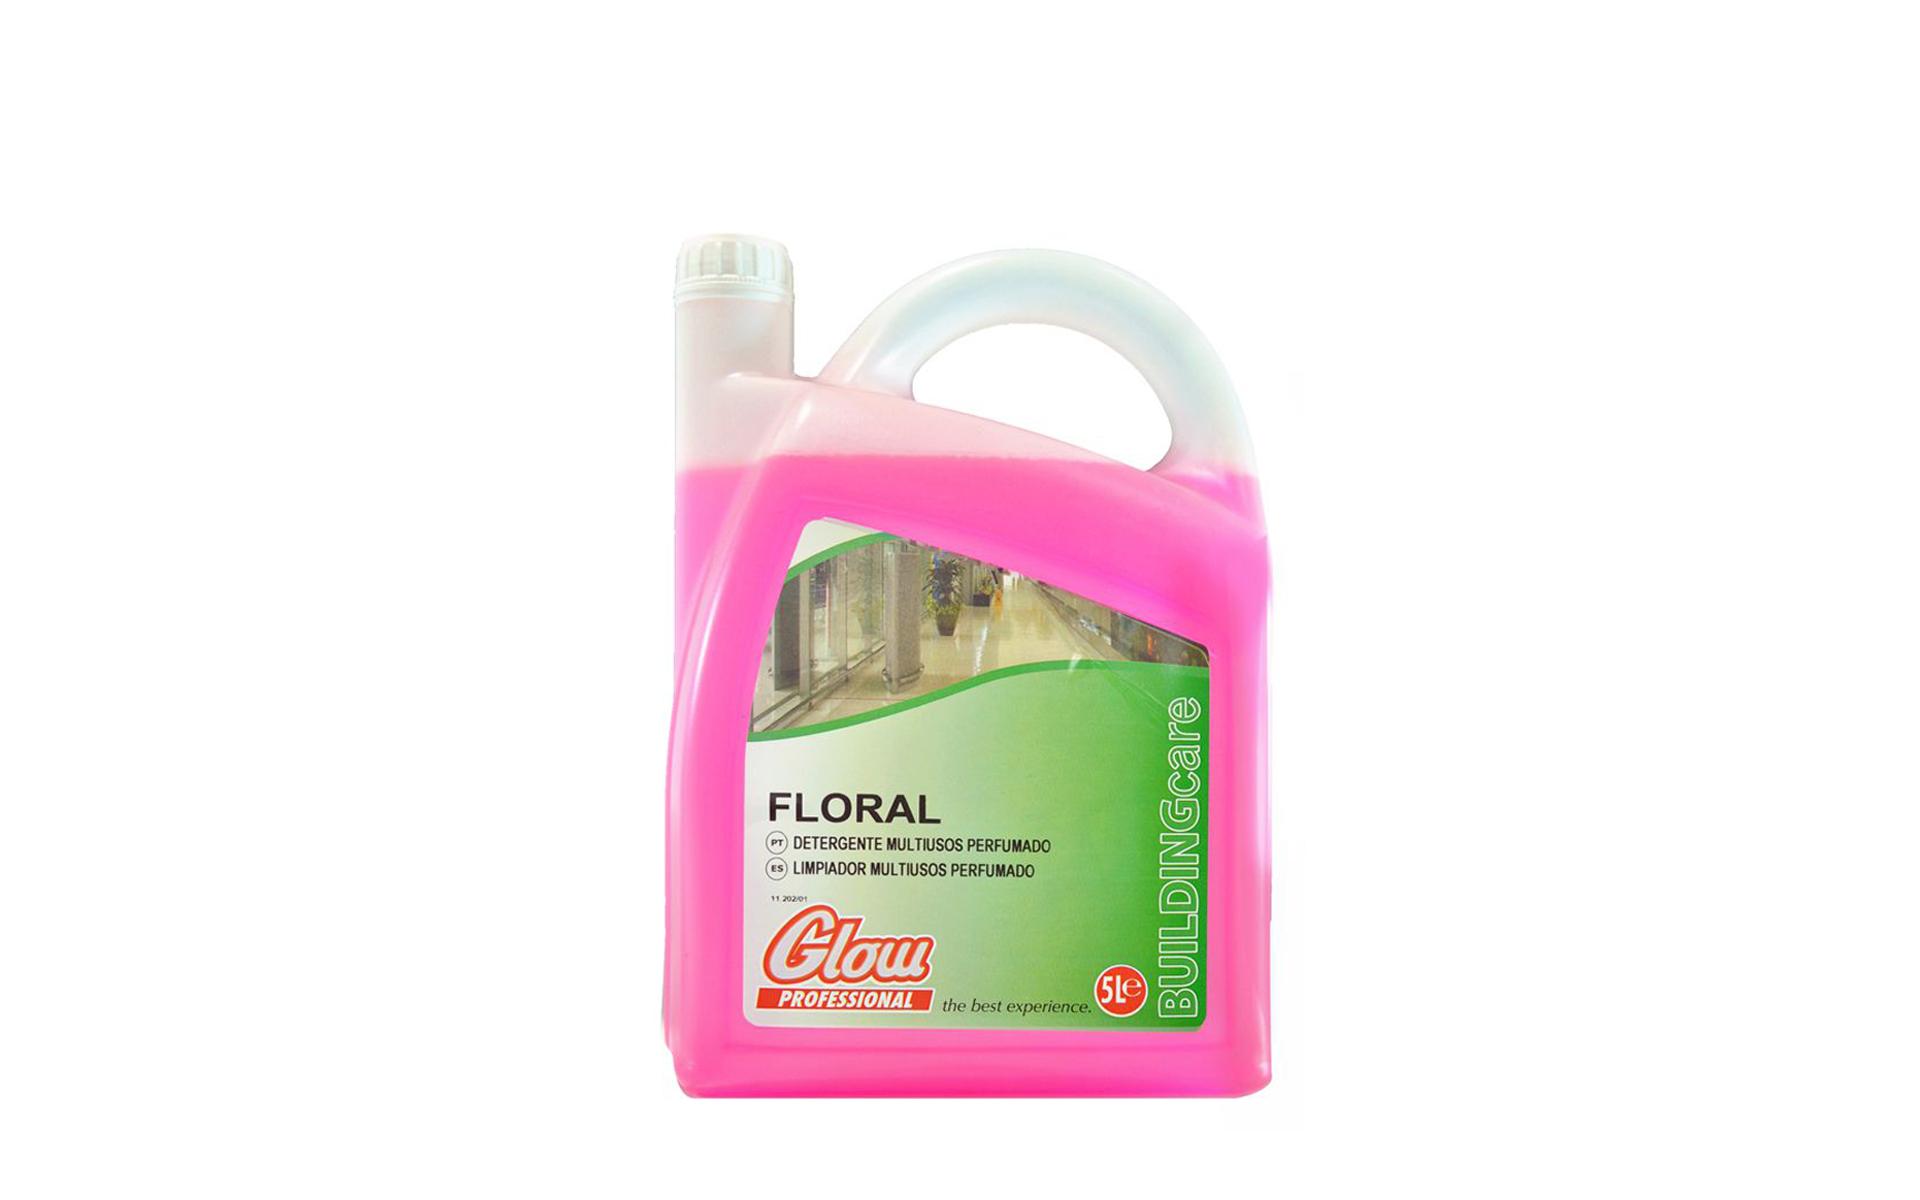 Fregasuelos floral 5 litros